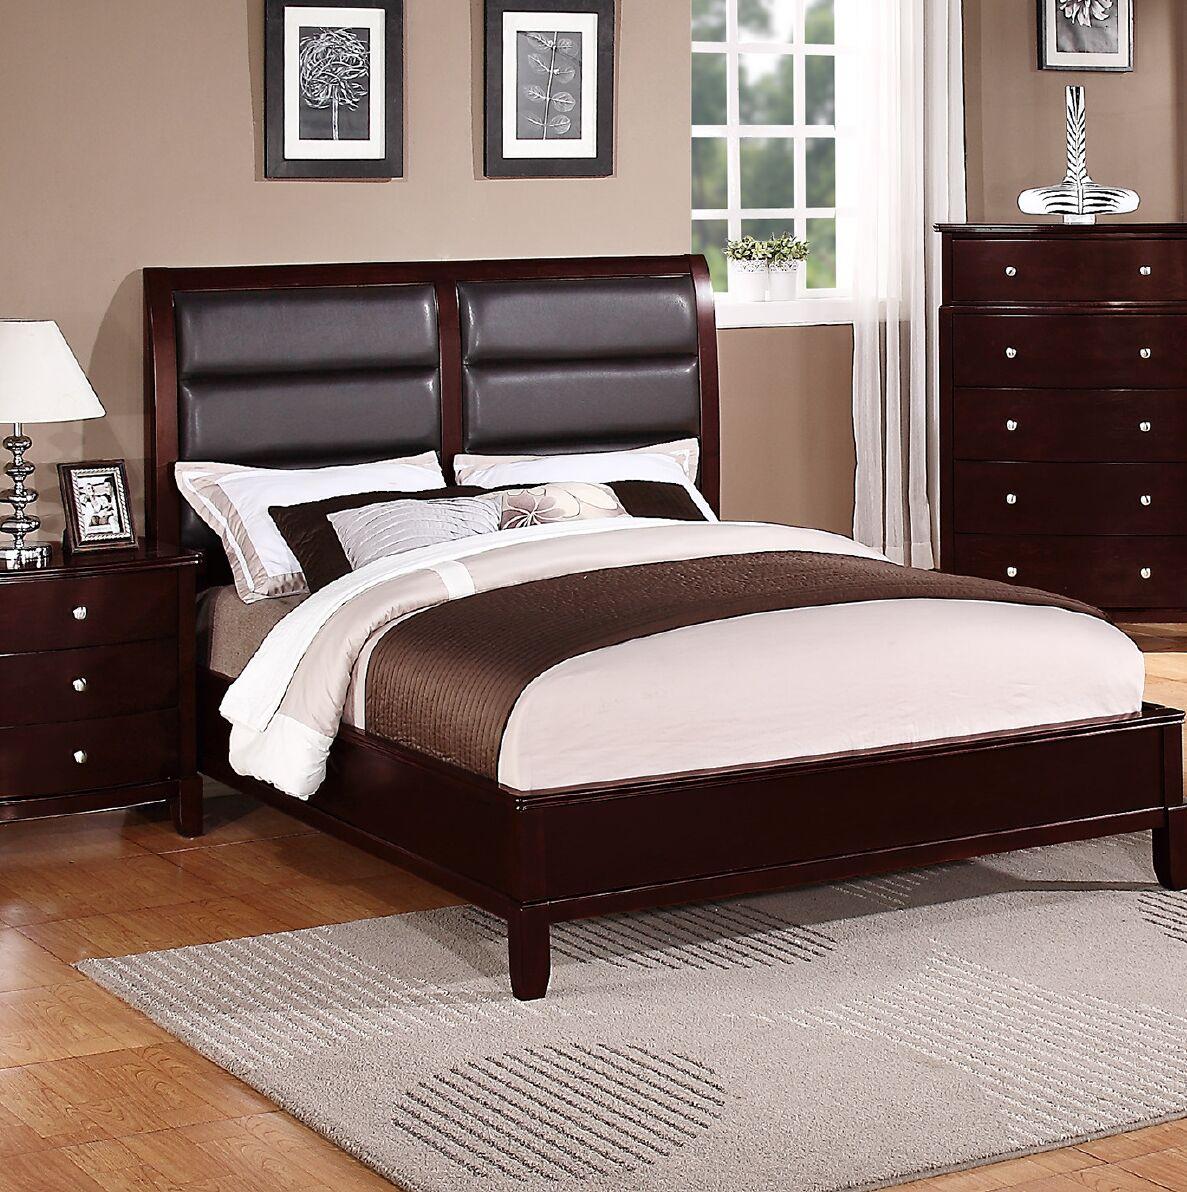 Terwilliger Upholstered Panel Bed Size: California King